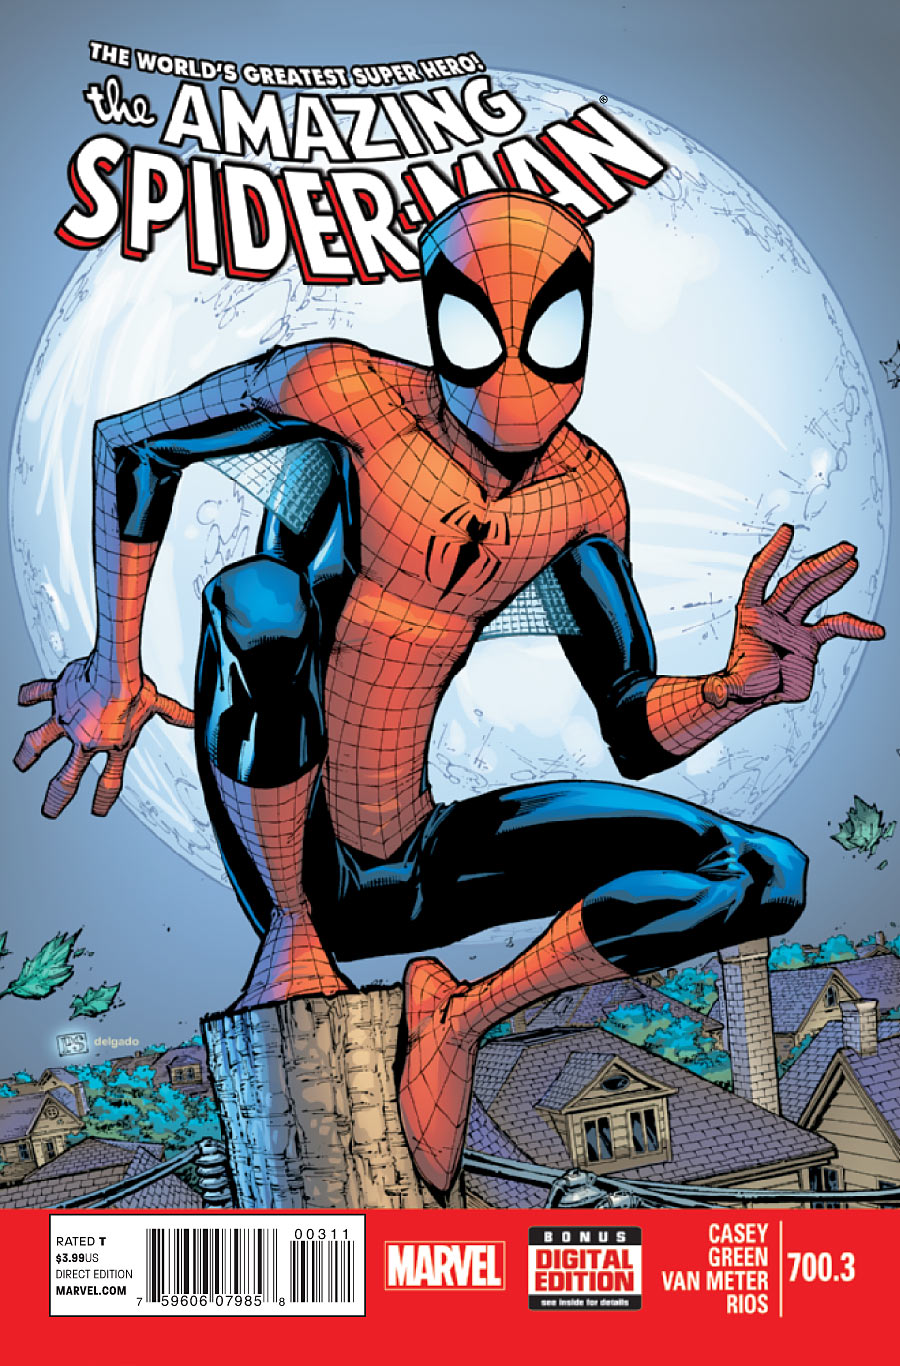 The Amazing Spider-Man #700.3